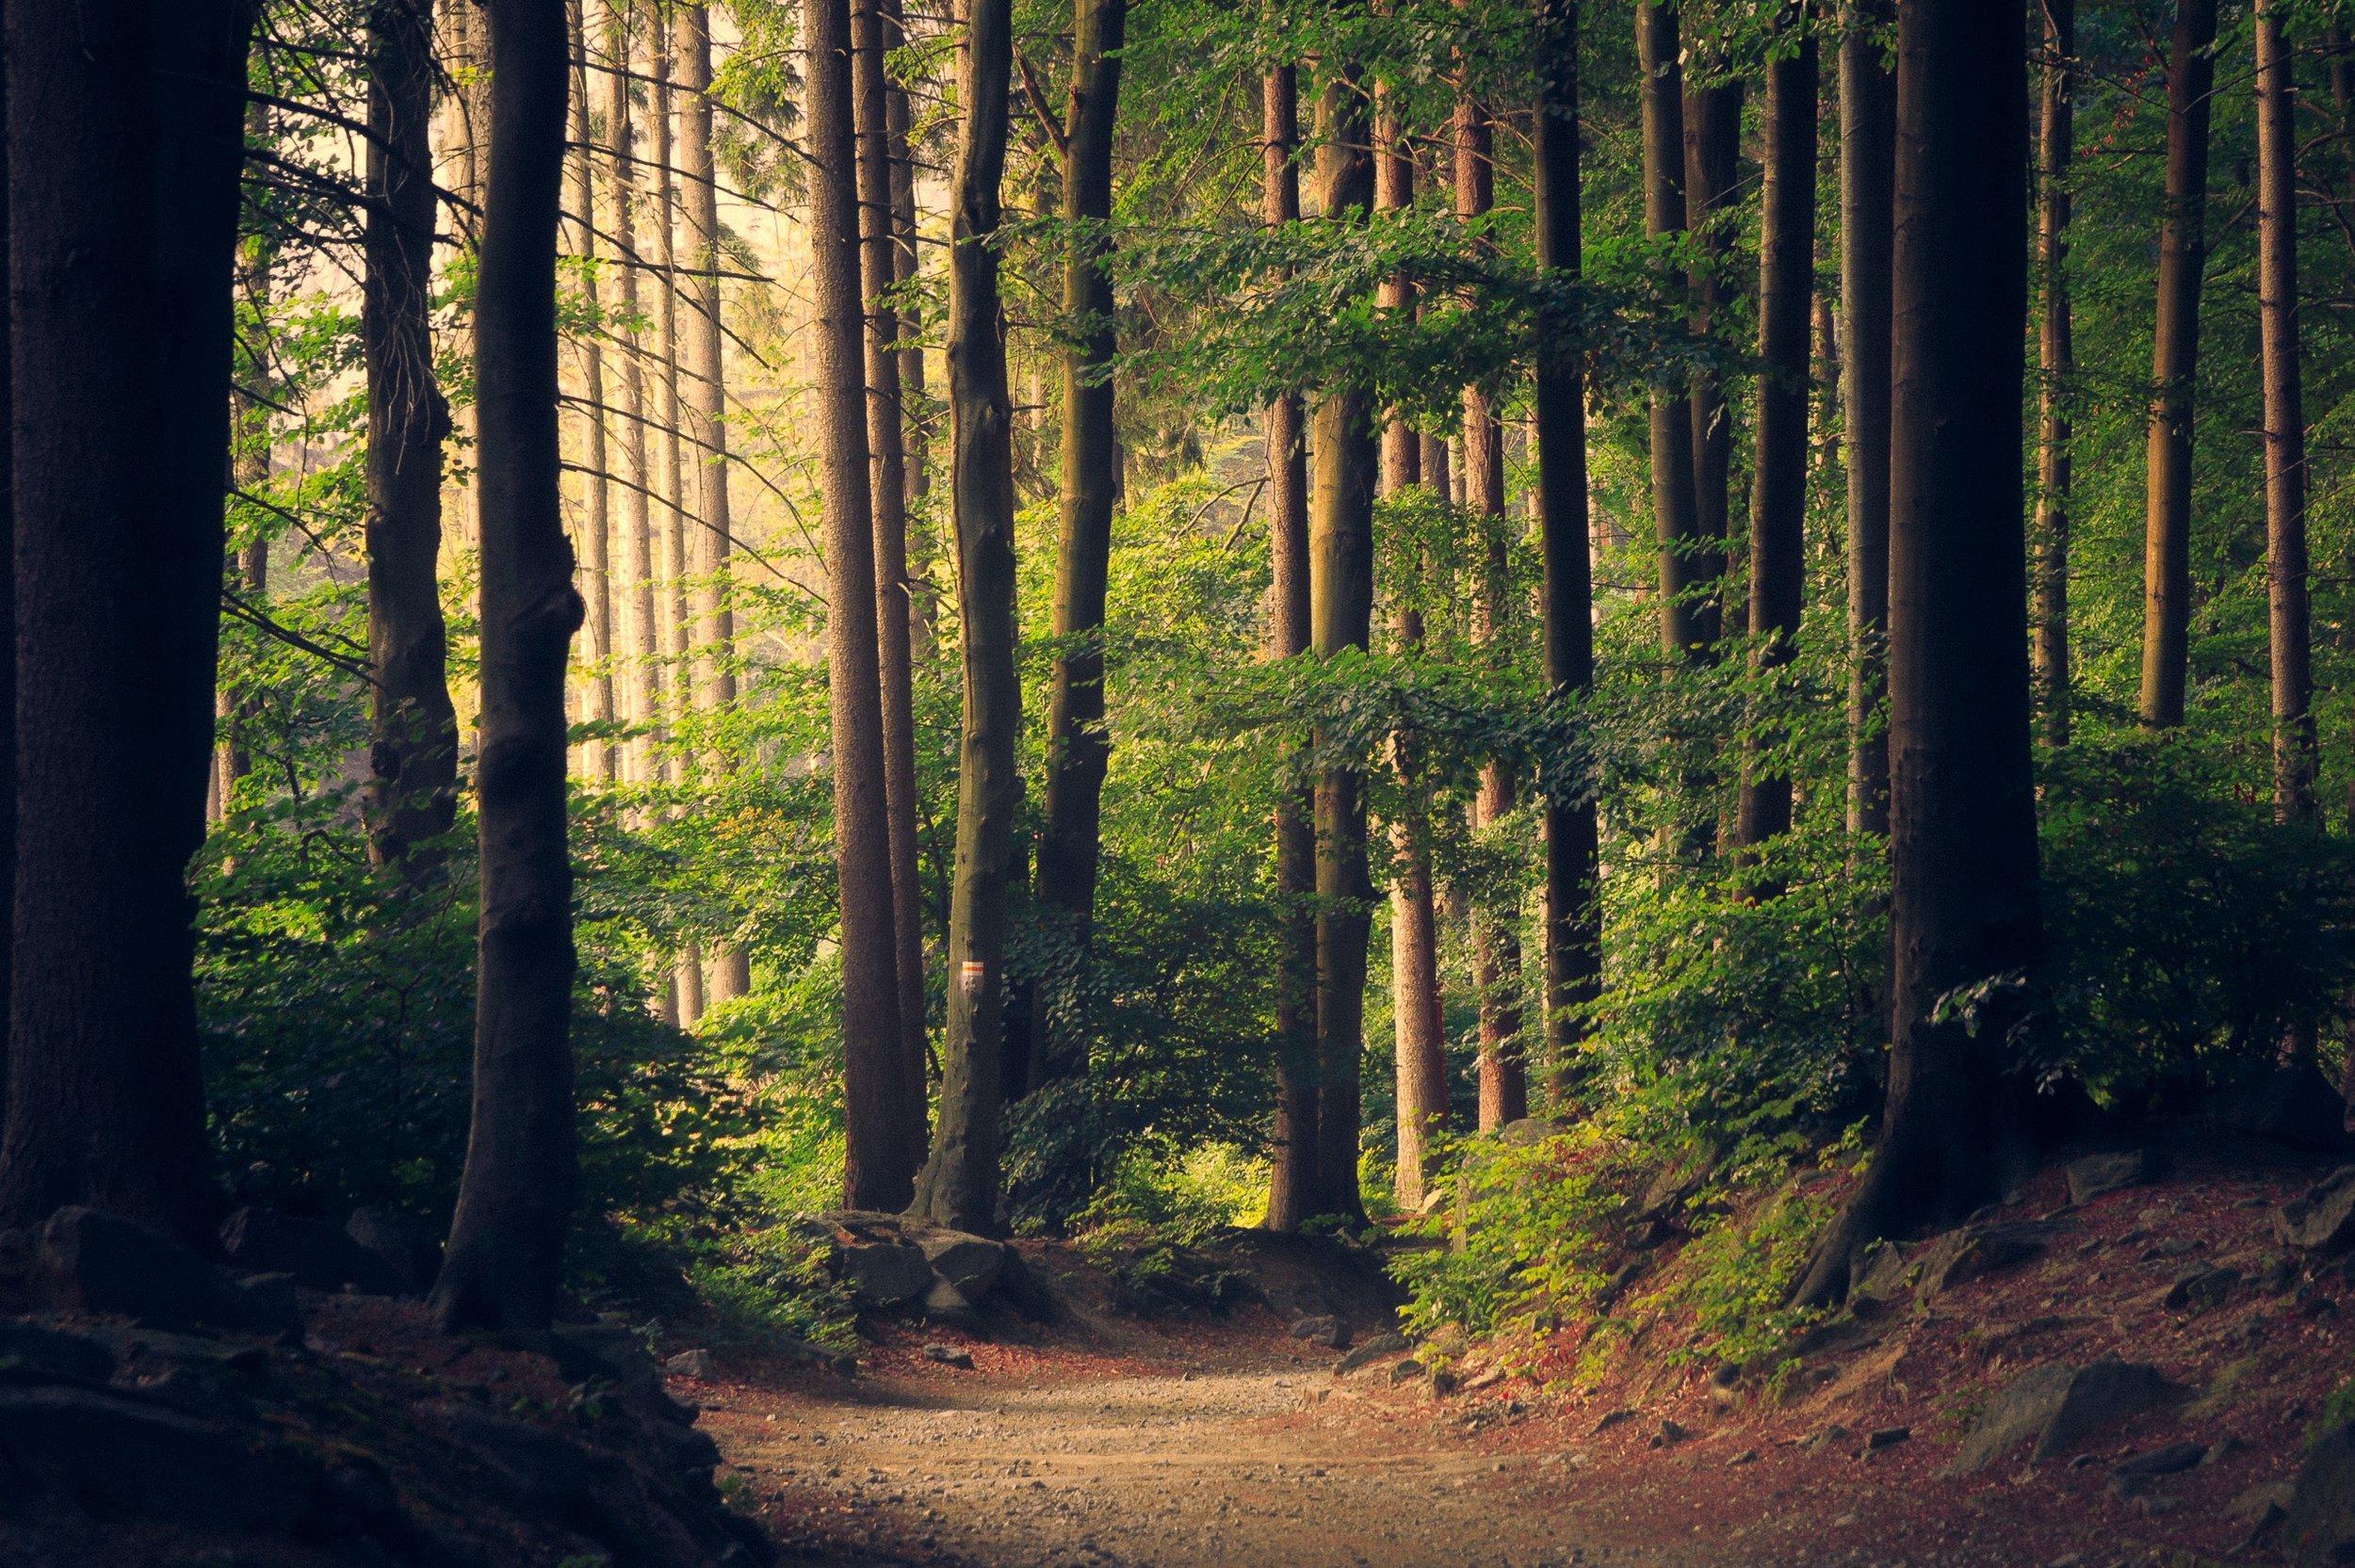 forests pexels-photo-26559.jpg